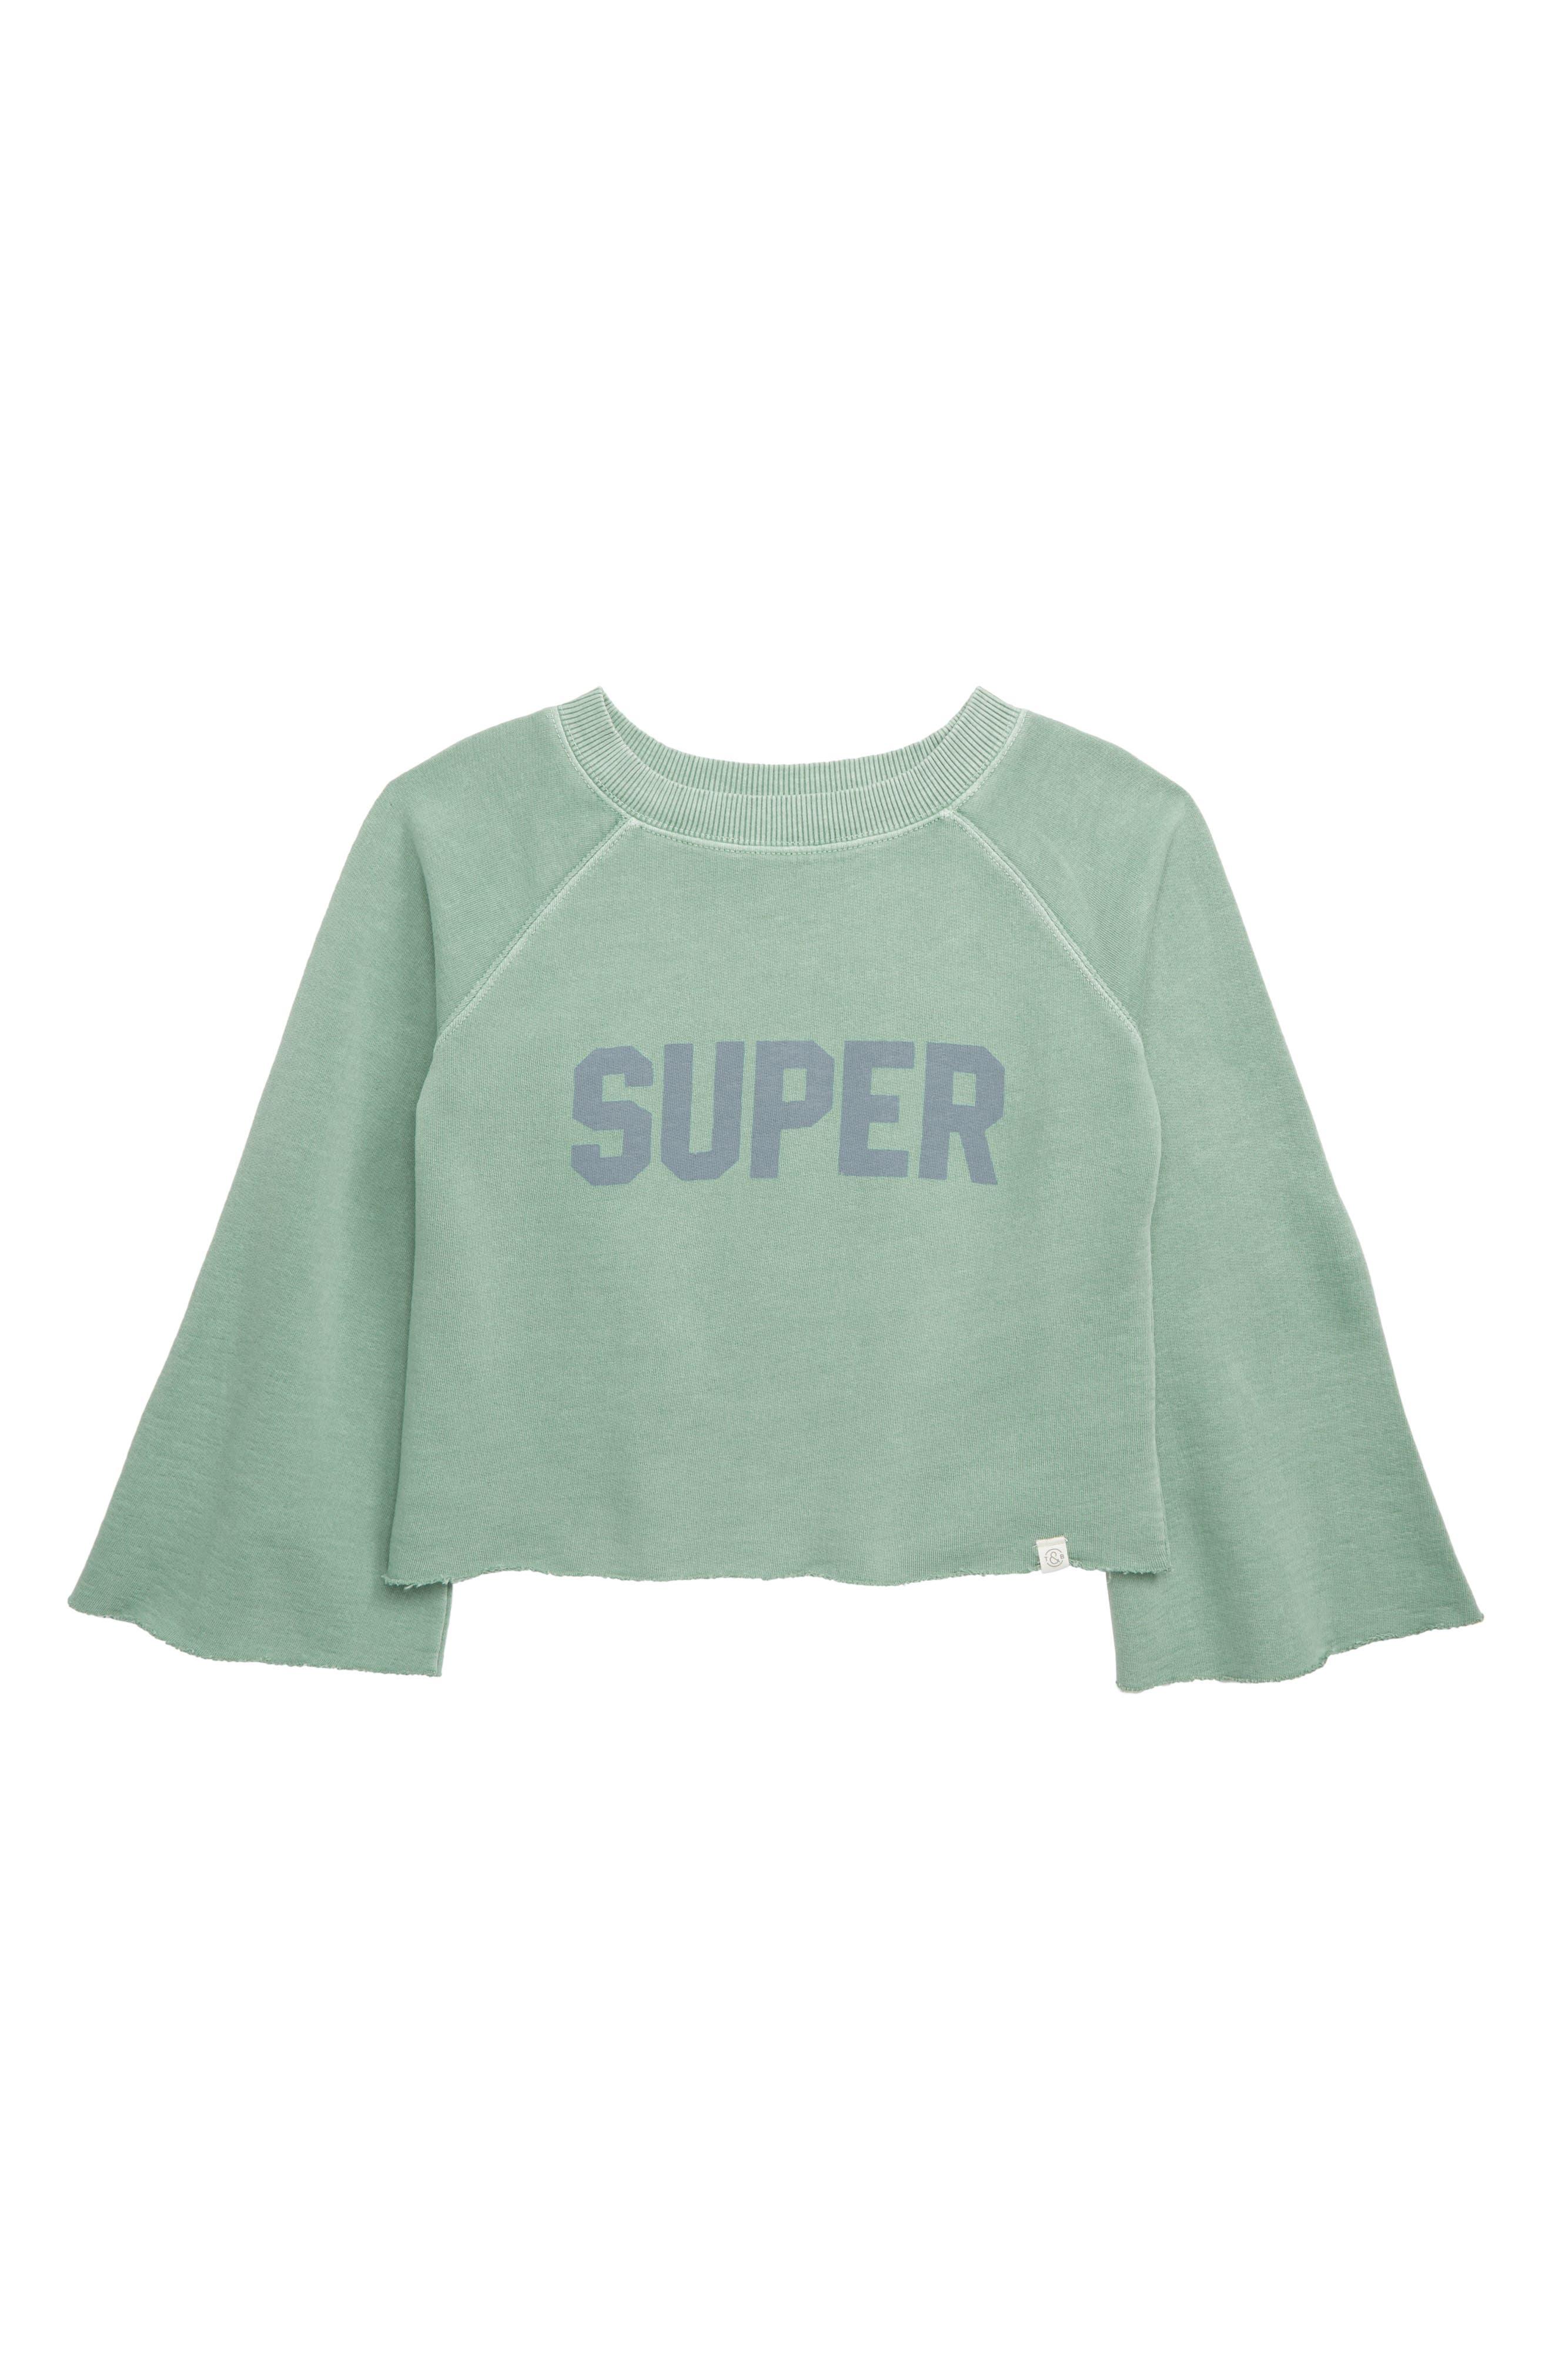 TREASURE & BOND Washed Wide Sleeve Sweatshirt, Main, color, GREEN WING SUPER